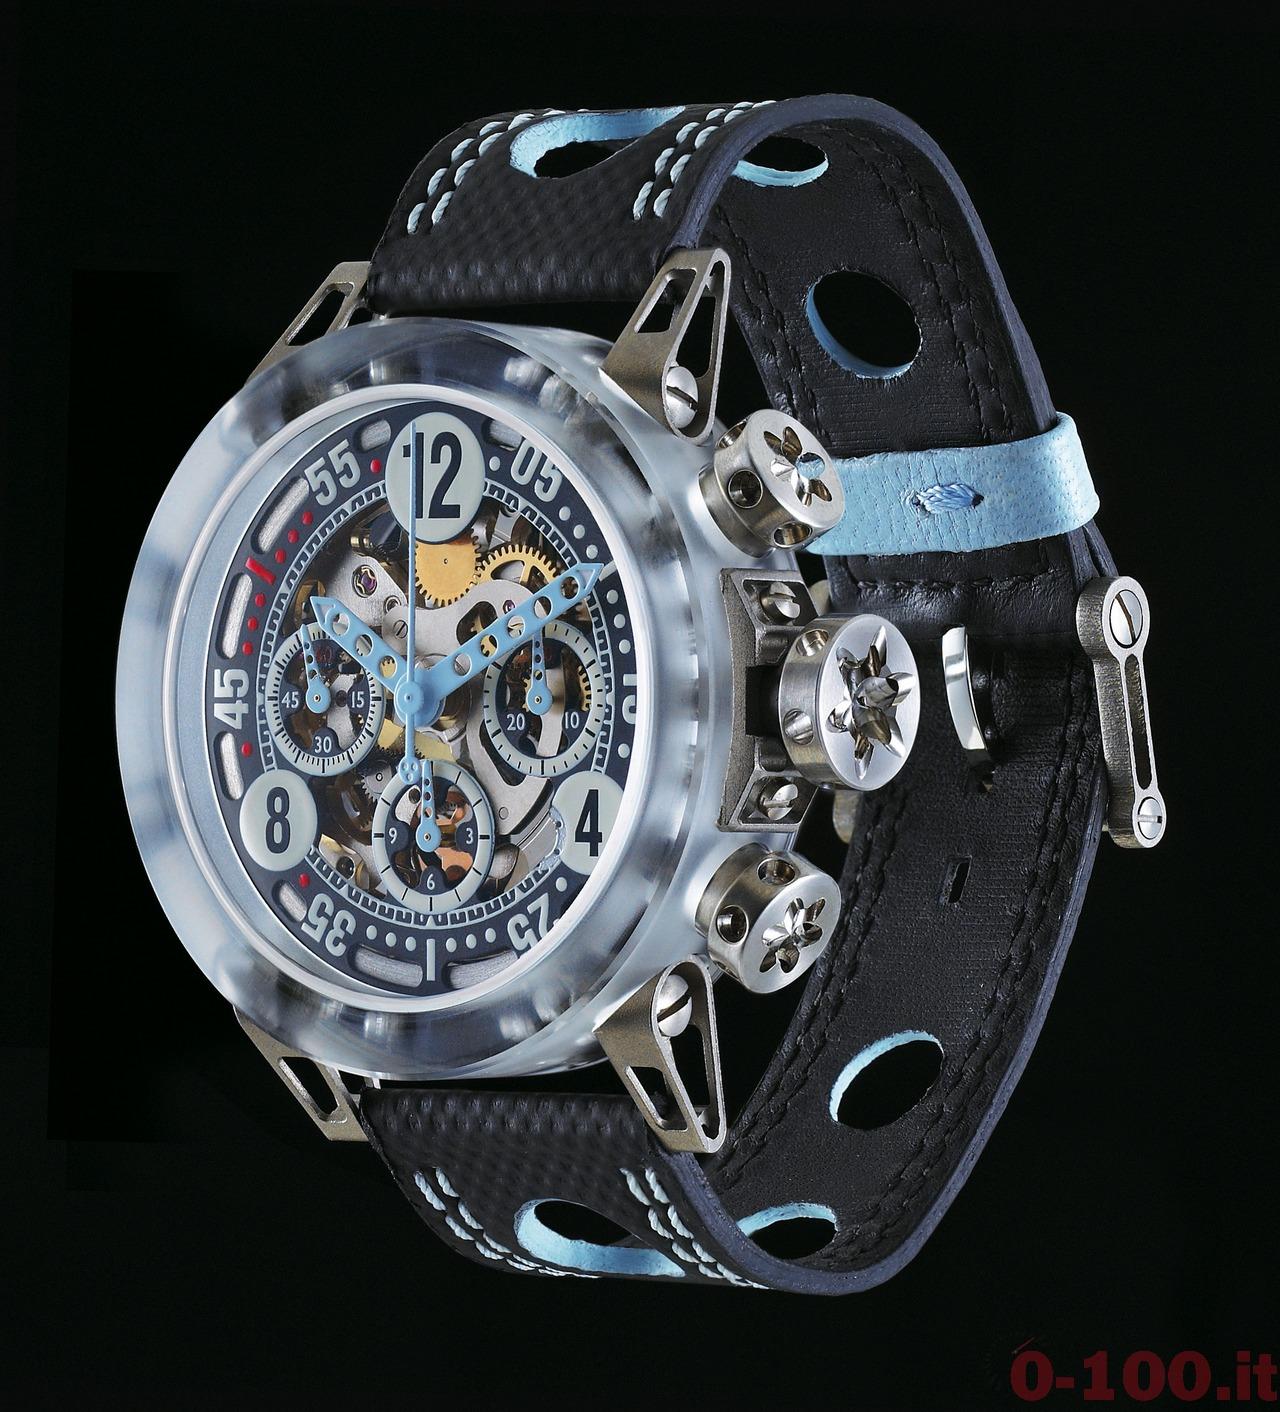 brm-mk-44-prezzo-price_0-1001